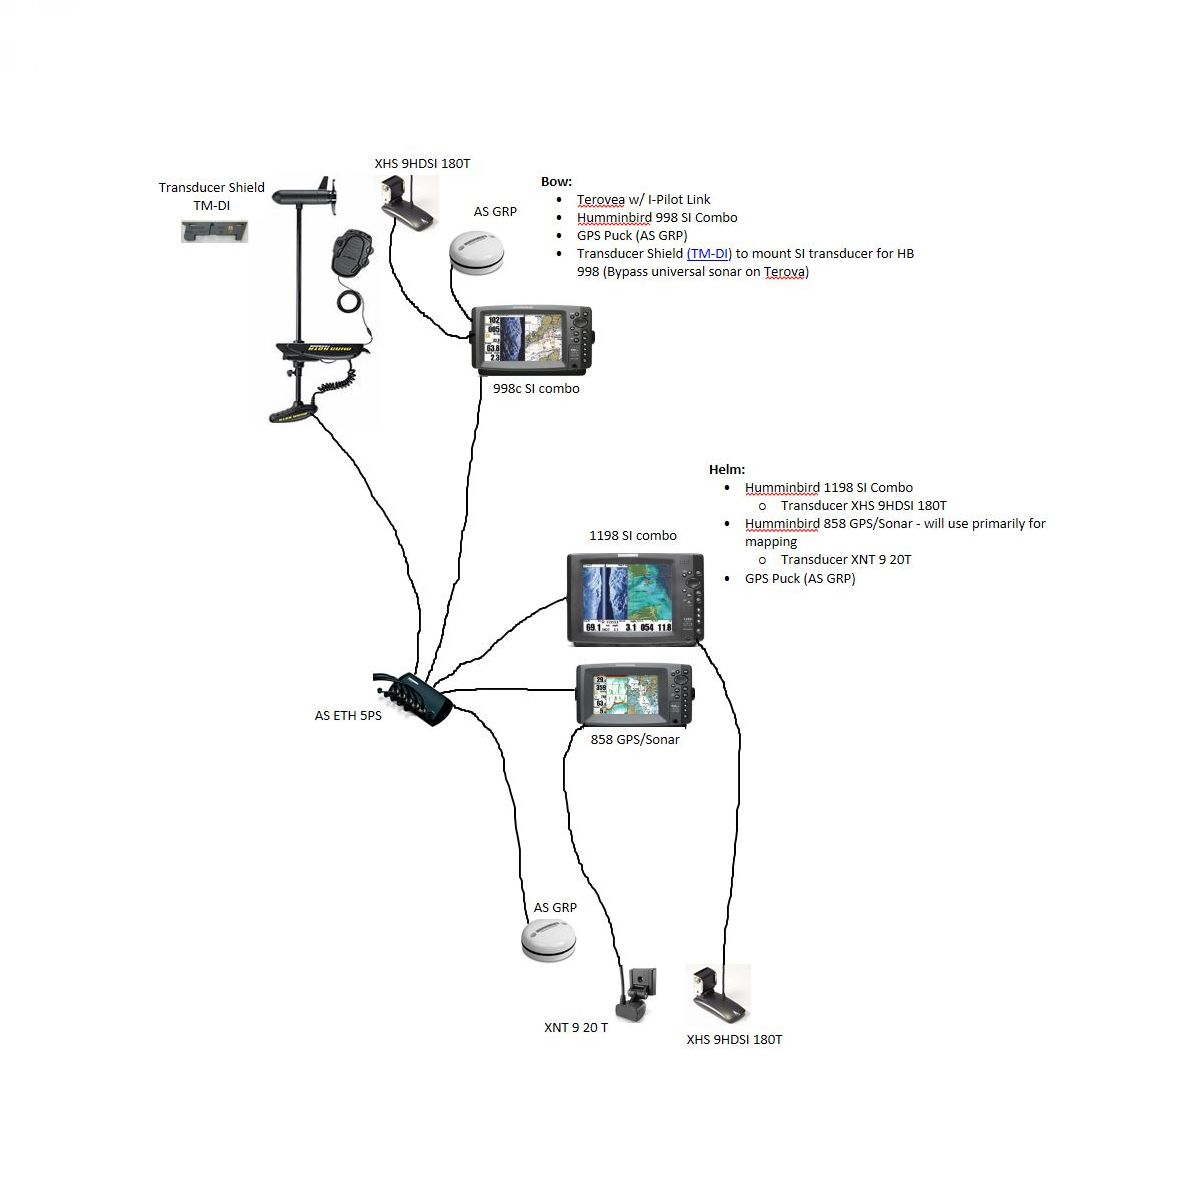 Humminbird HELIX 7 CHIRP SI GPS G2N (NMEA) | | Cijena